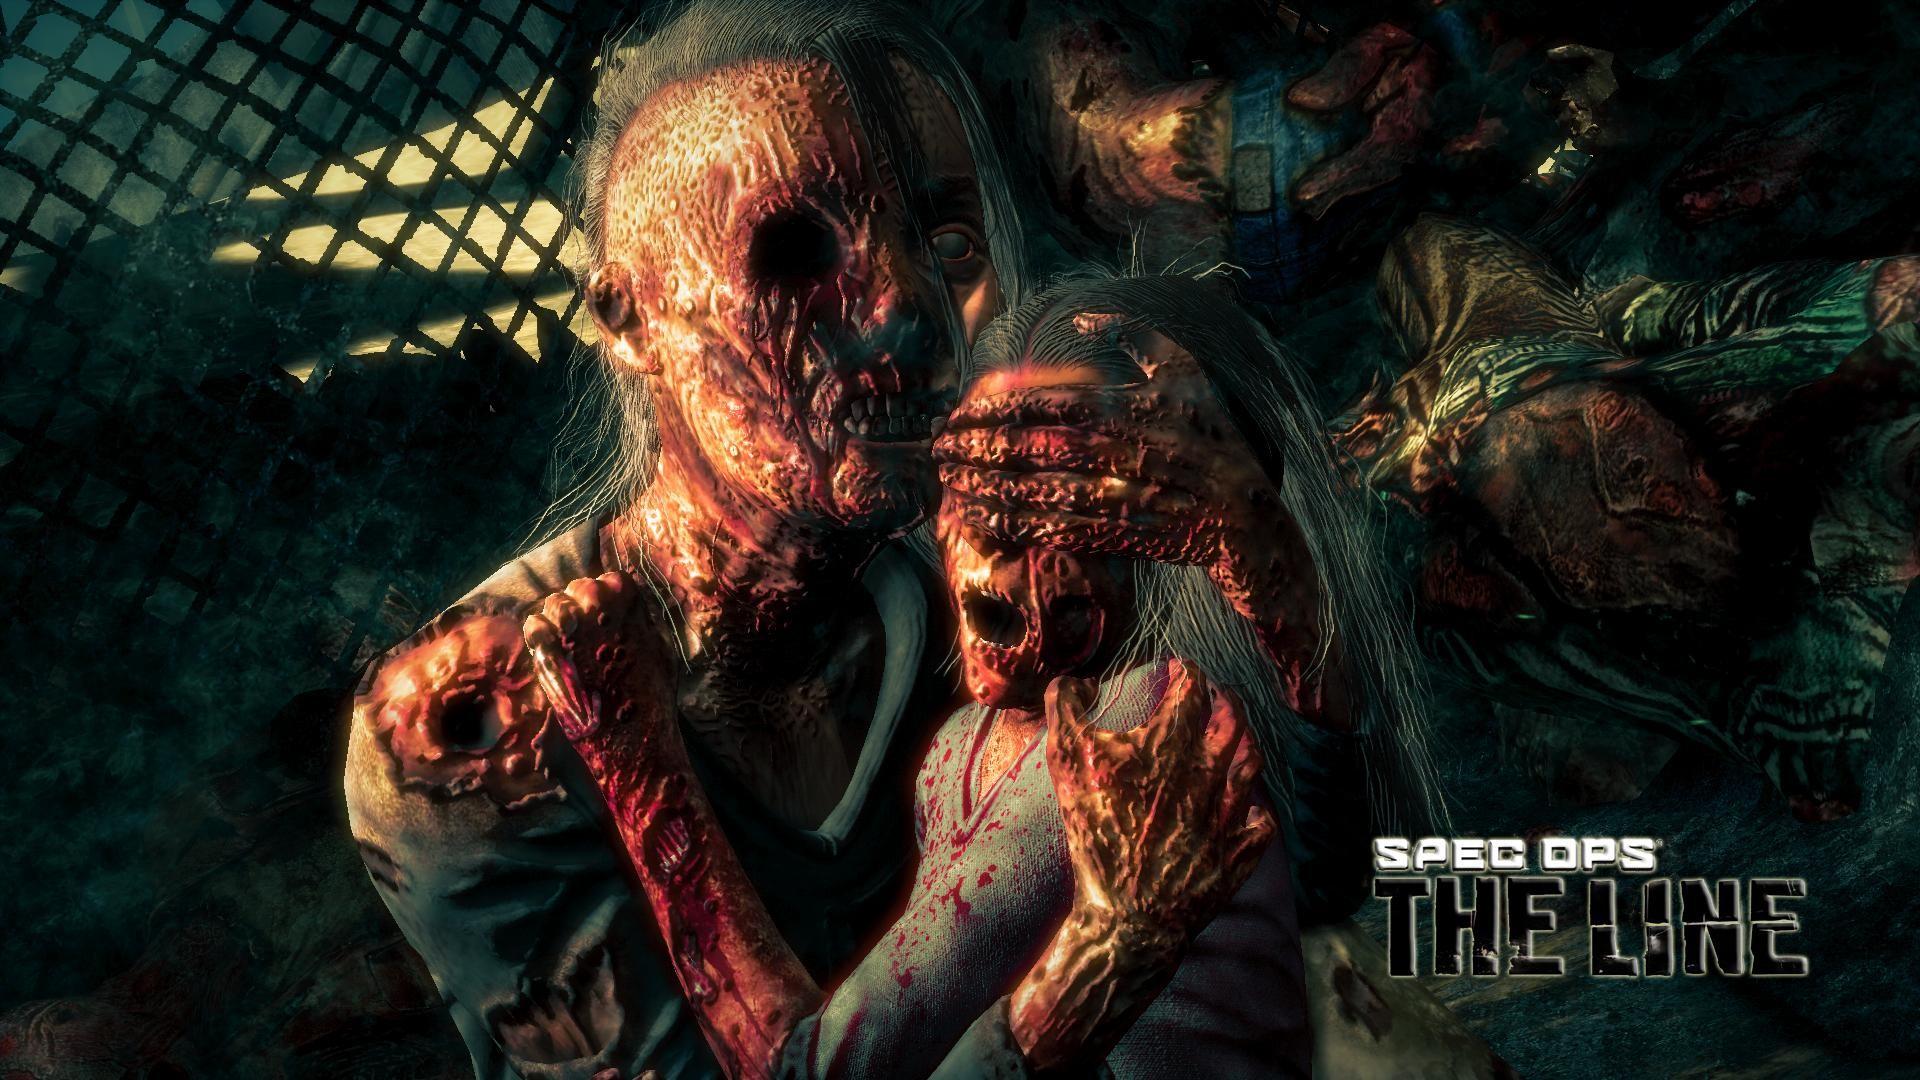 Zombies Wallpaper HD (pixel) Popular HD Wallpaper #27007 .